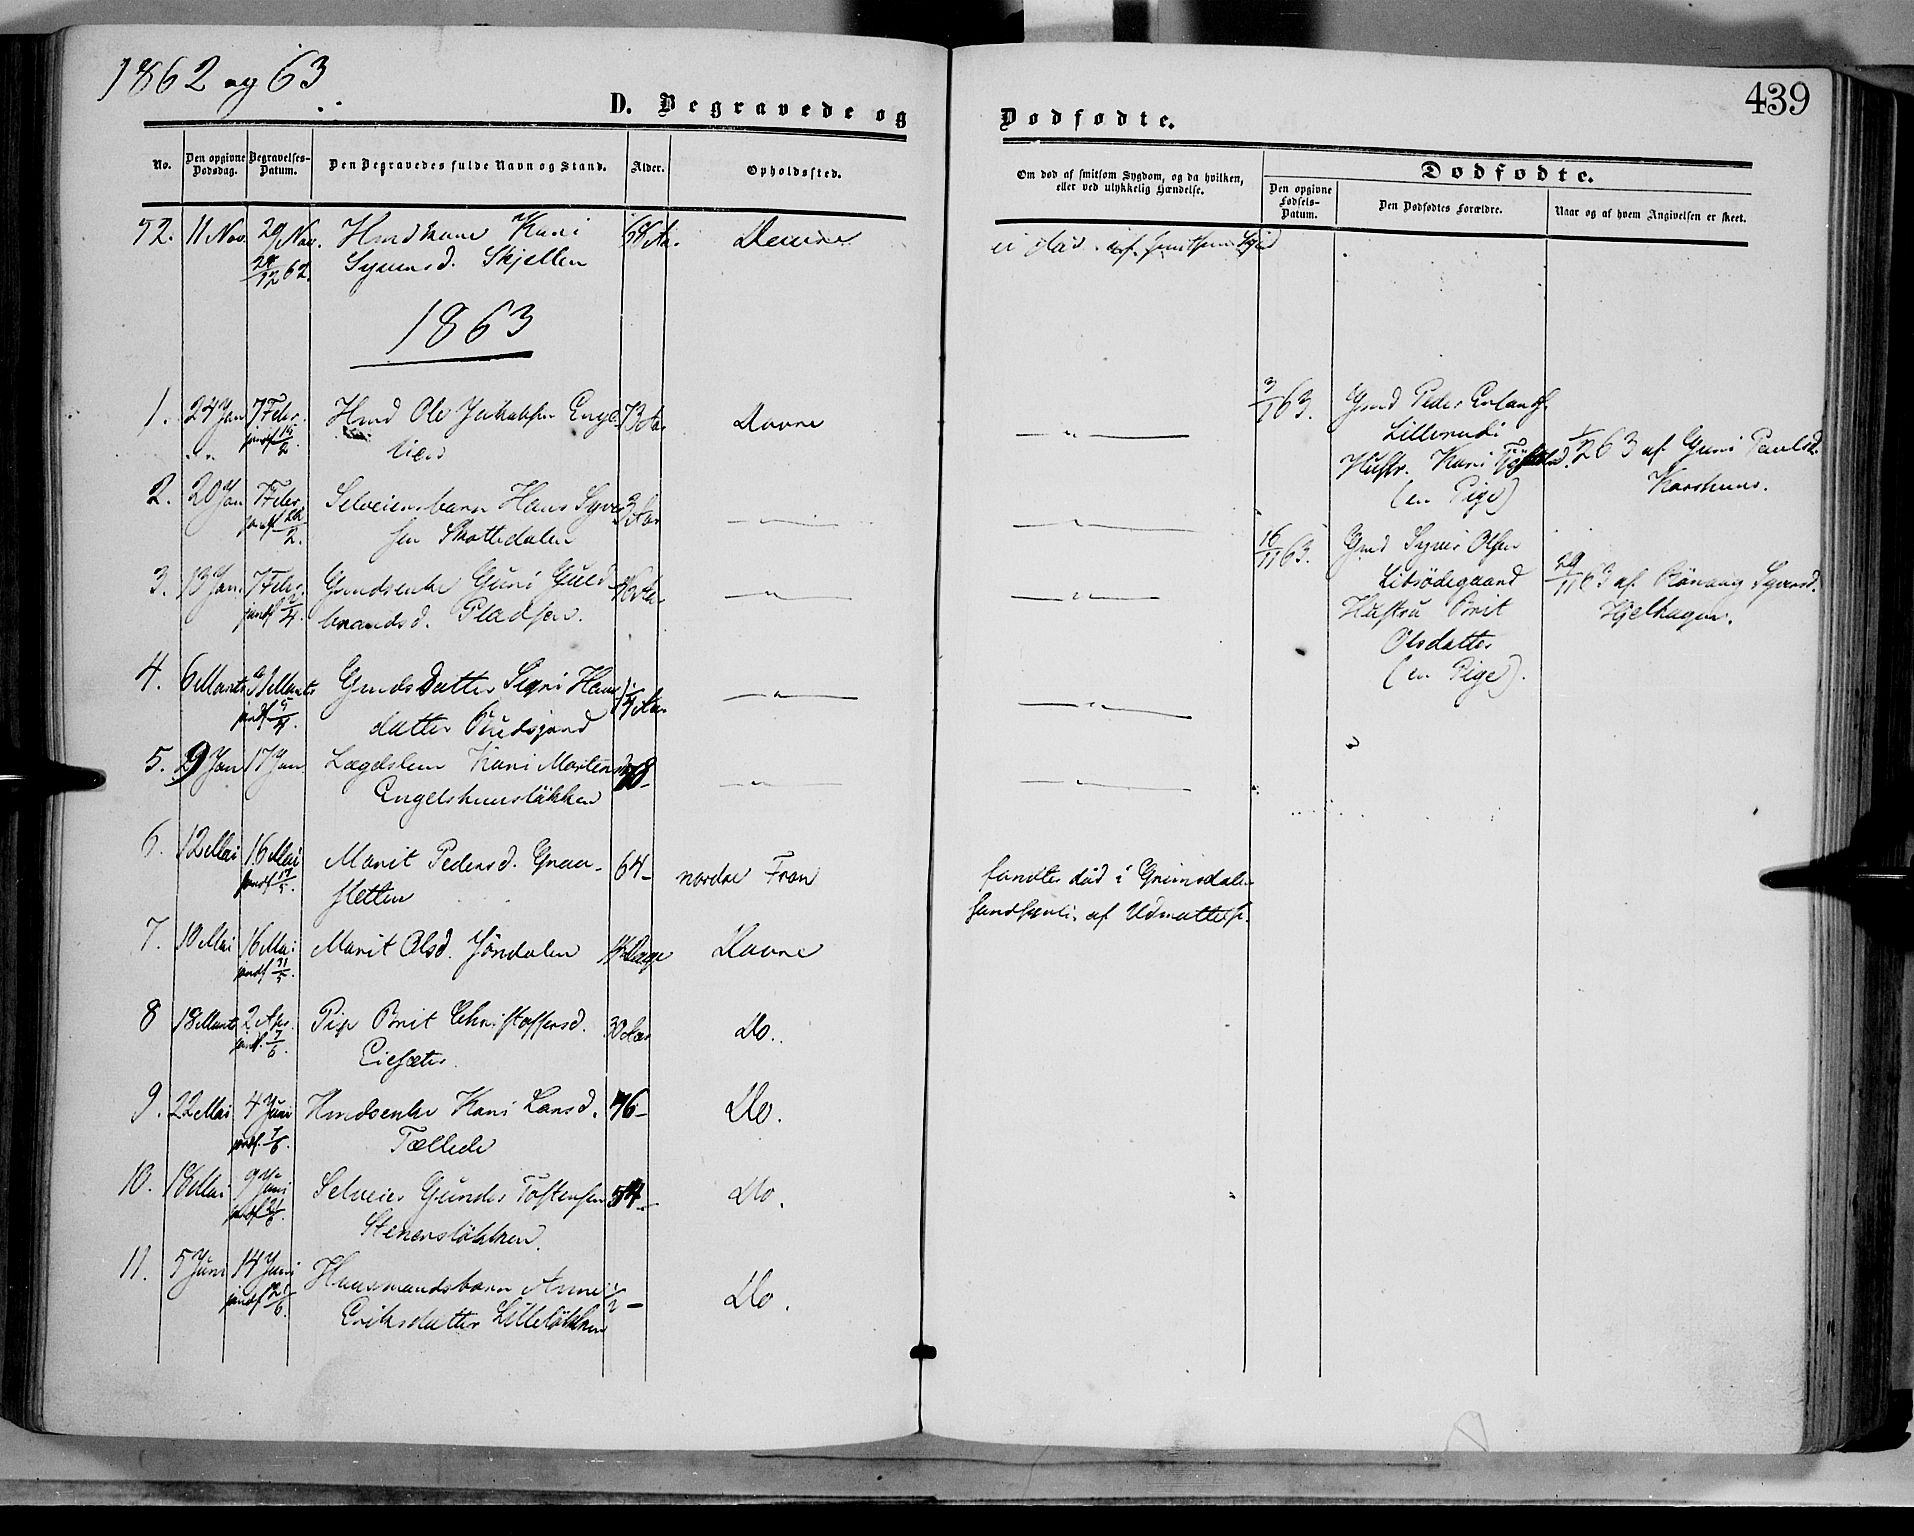 SAH, Dovre prestekontor, Ministerialbok nr. 1, 1854-1878, s. 439